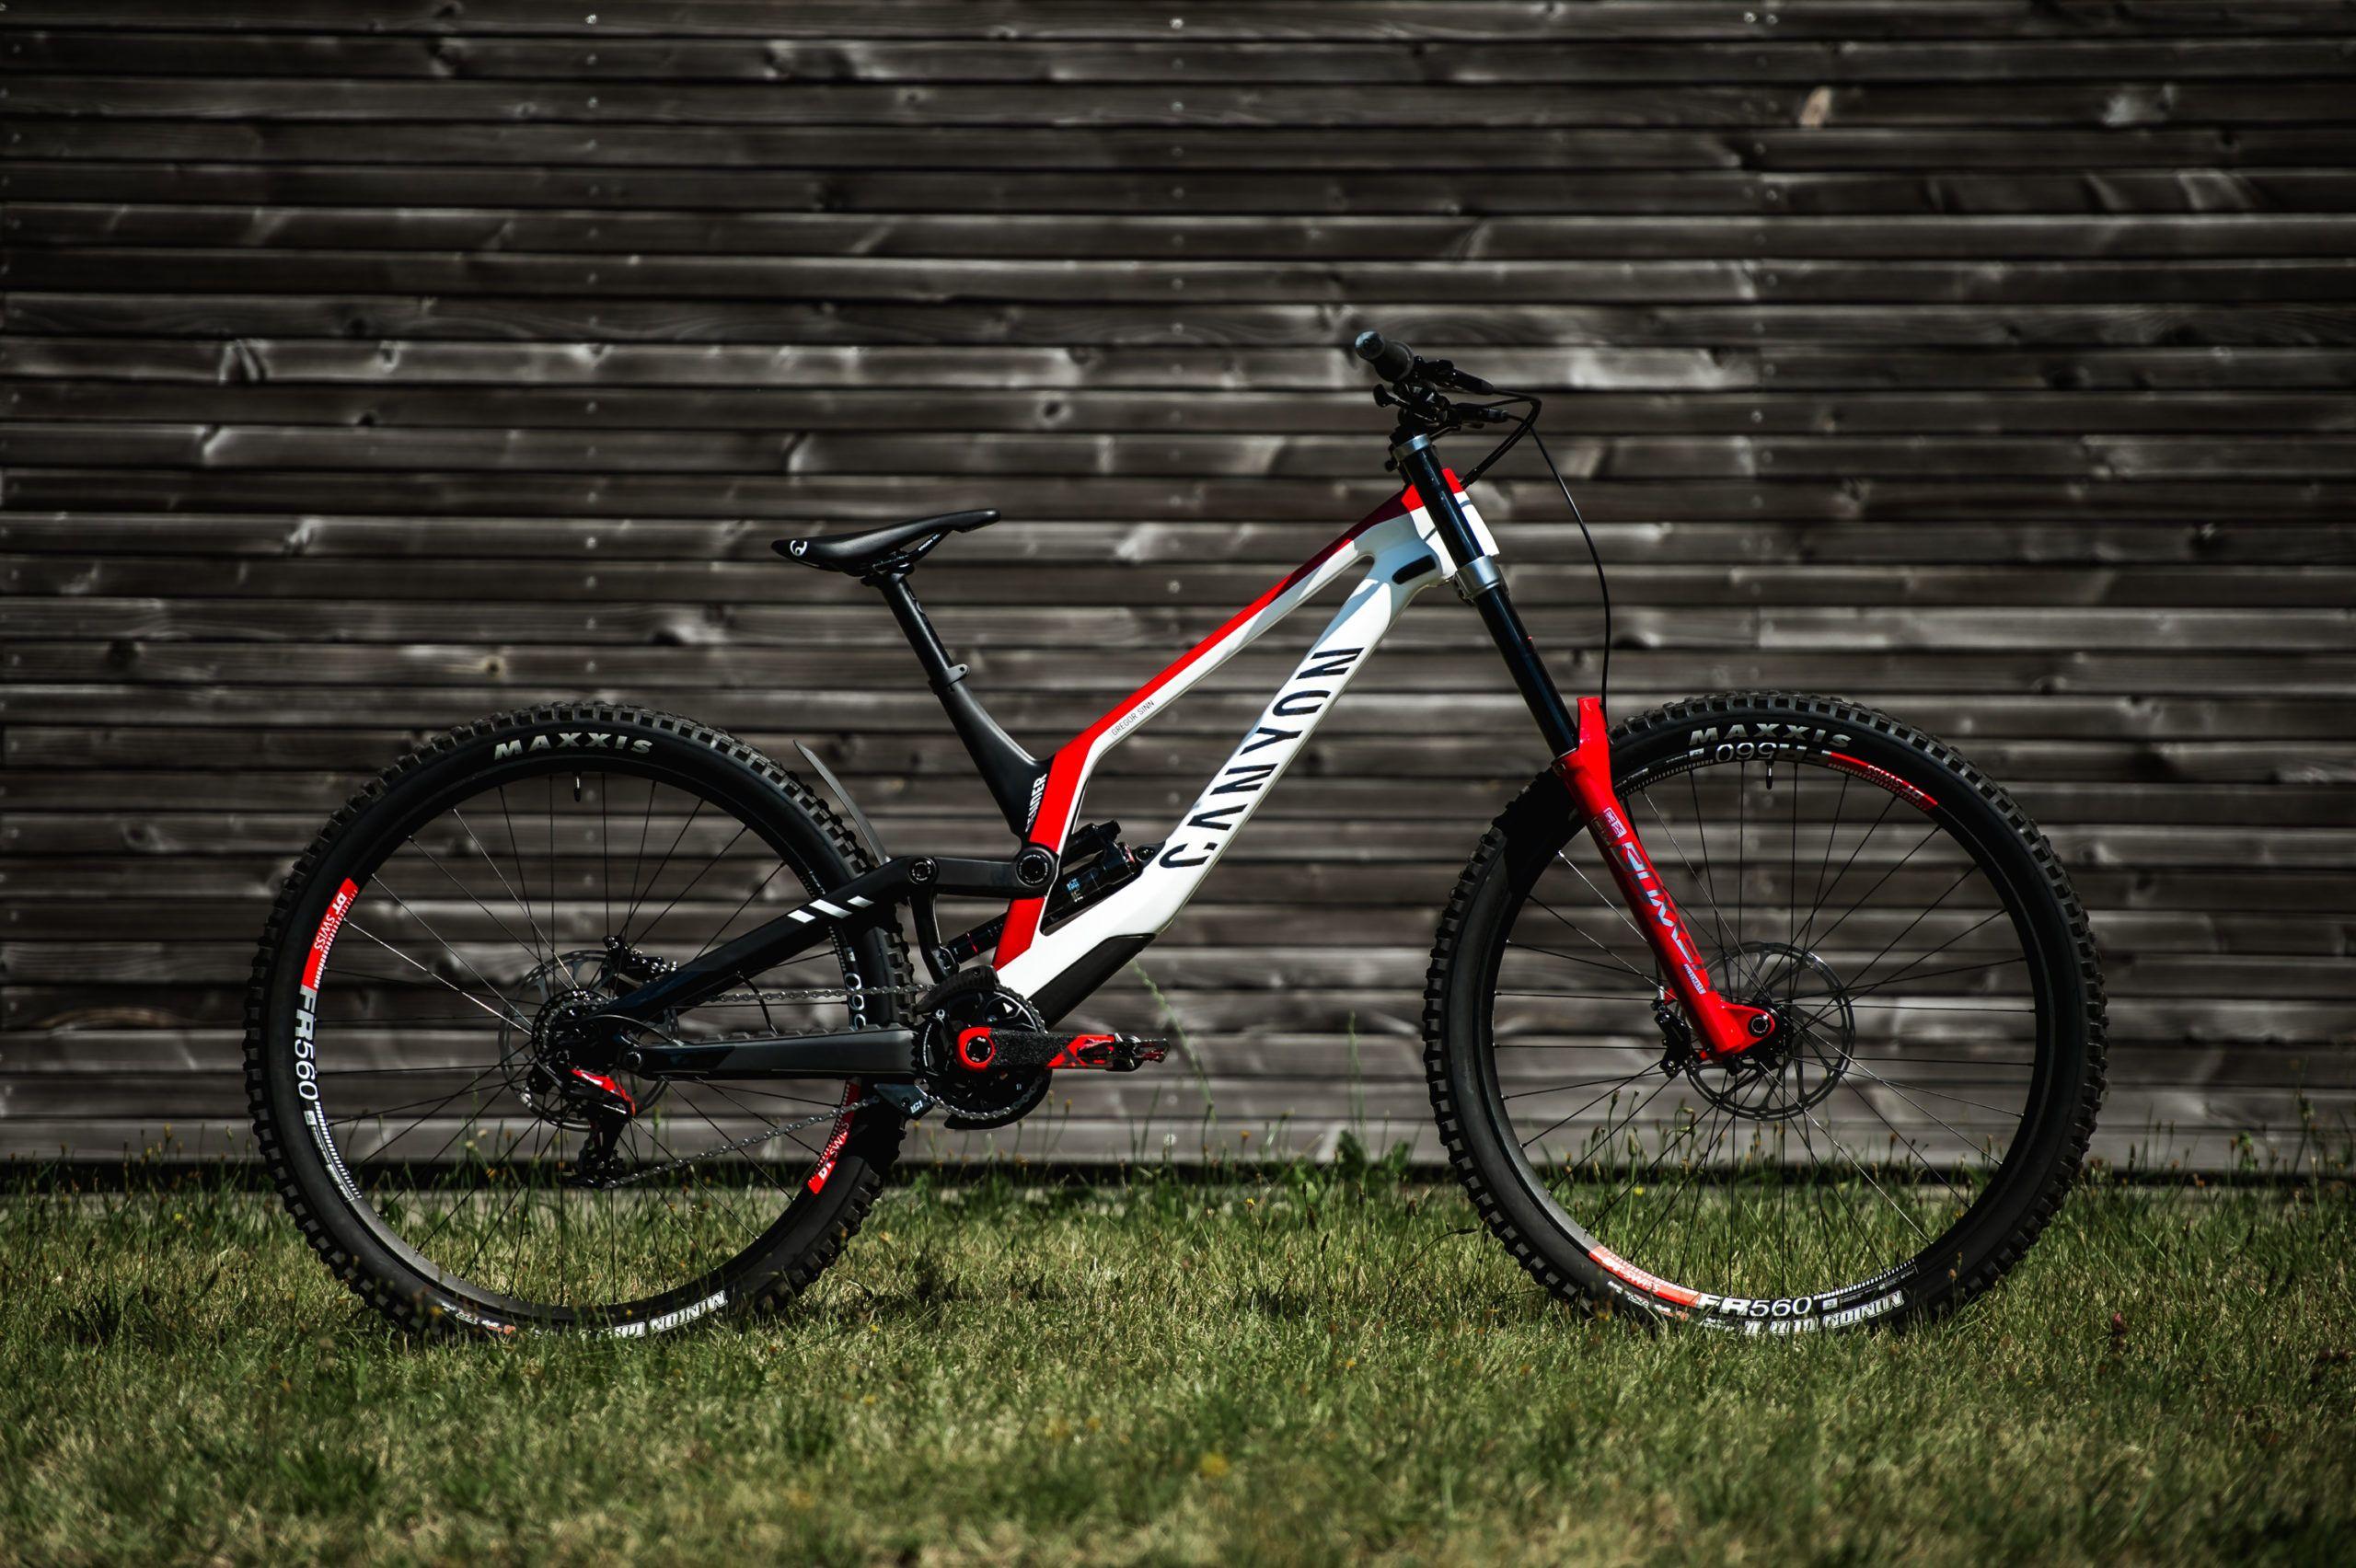 Canyon Sender Cfr Im Ersten Test Jetzt Als 29er Oder Mullet Bike In 2020 Laufrad Mtb Federgabel